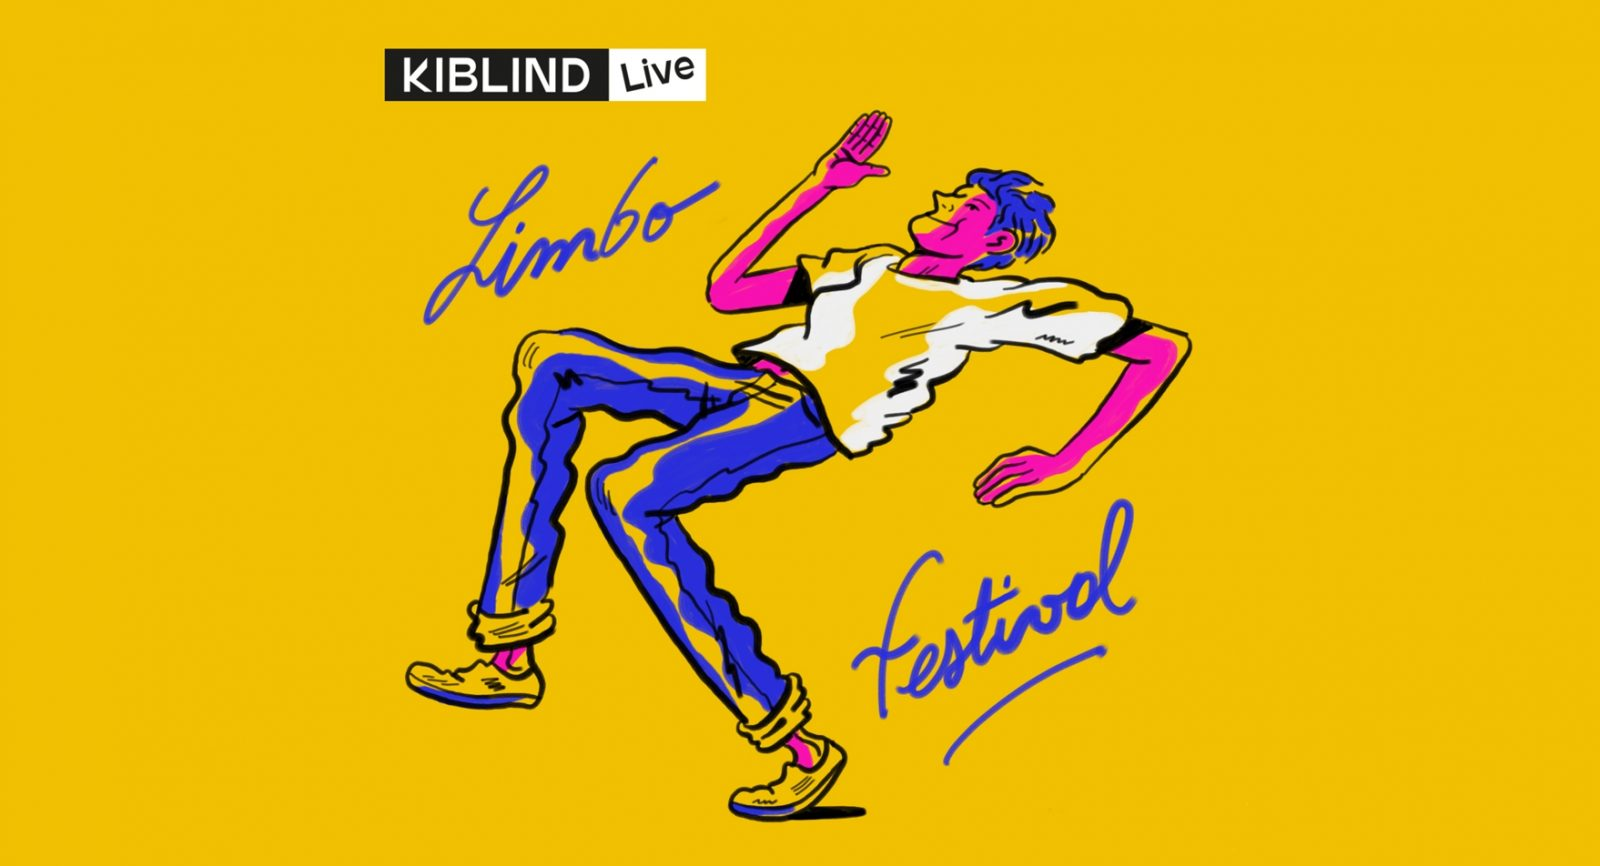 [Kiblind Live]. Limbo Festival